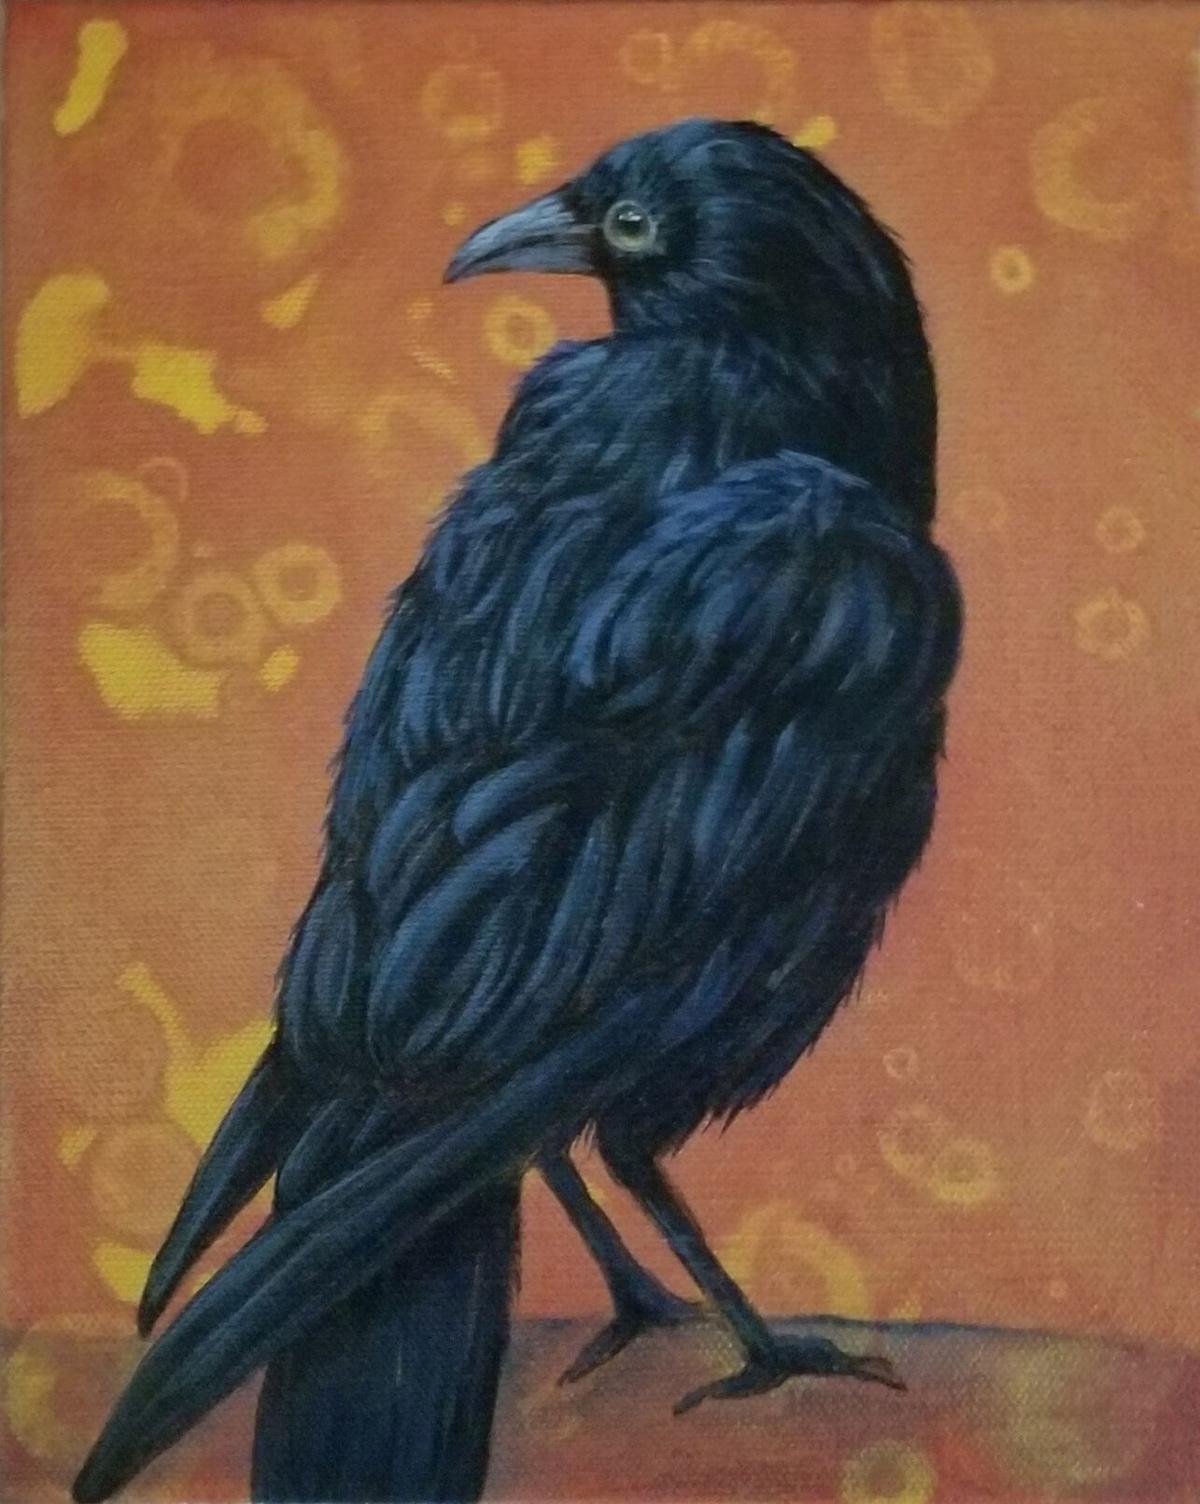 """Crow No. 1 on Gold"" by Barbara Jensen."